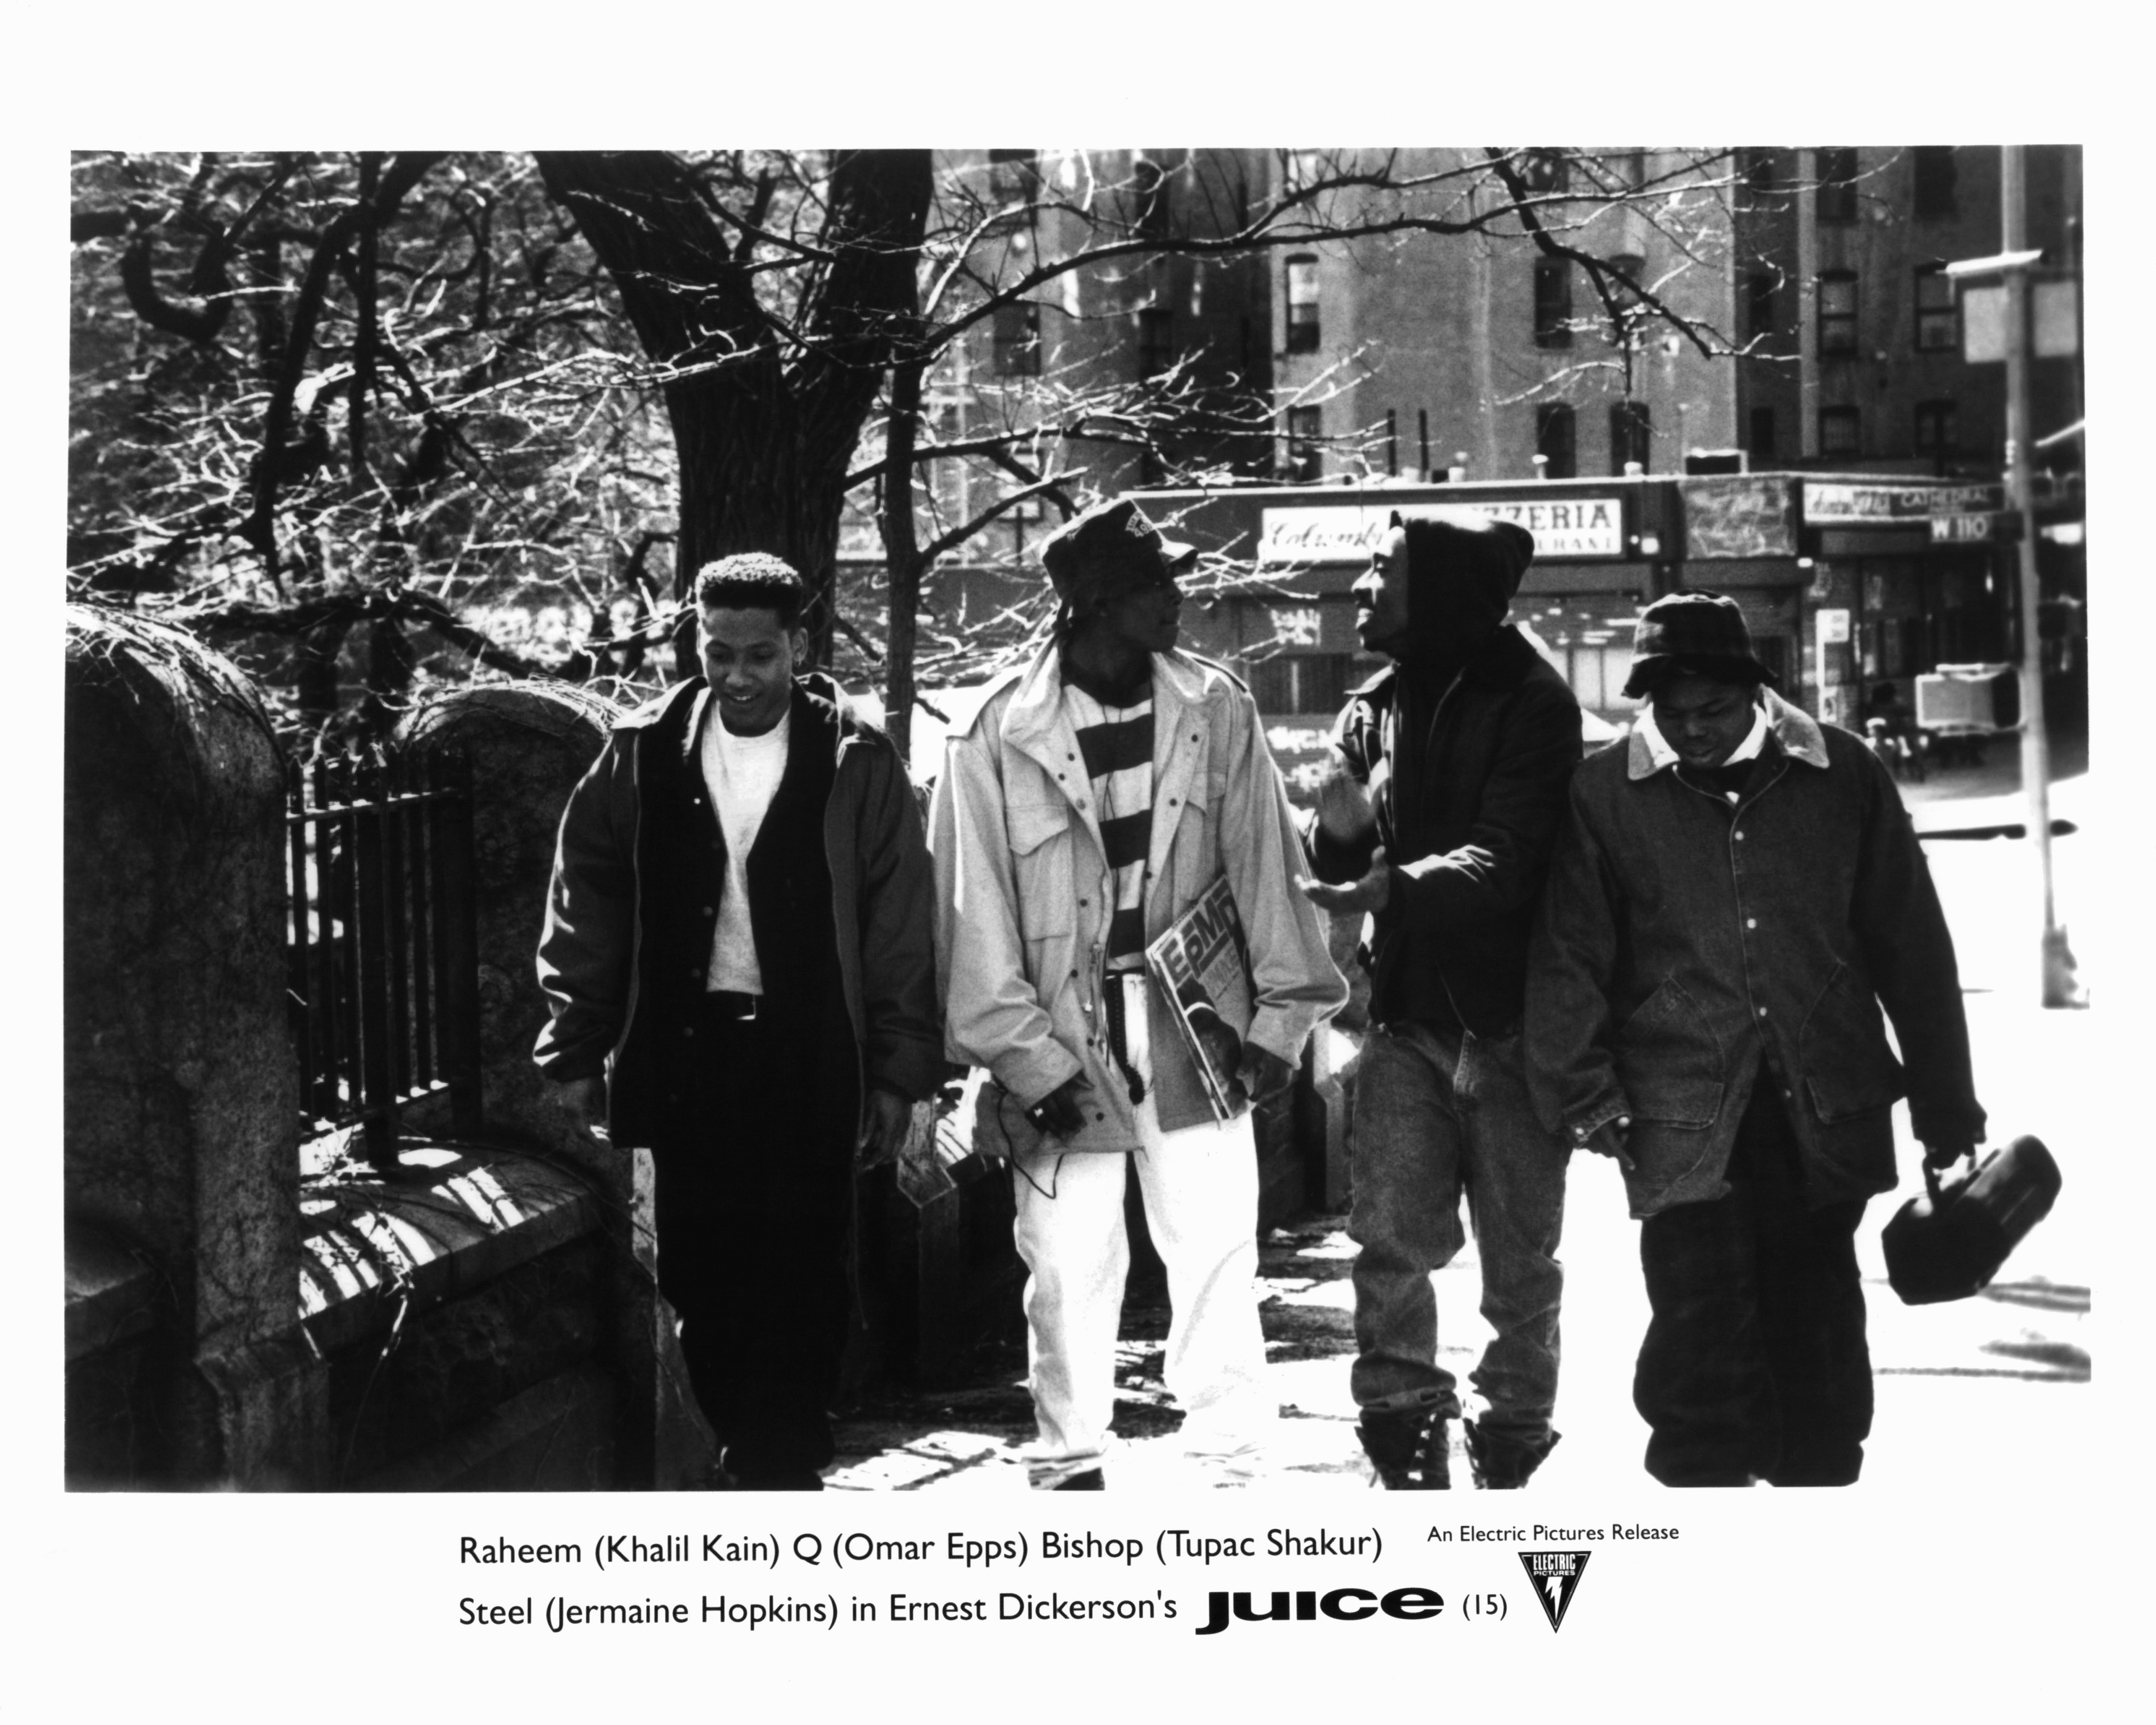 Omar-Epps-Tupac-Shakur-Juice-wphi-getty